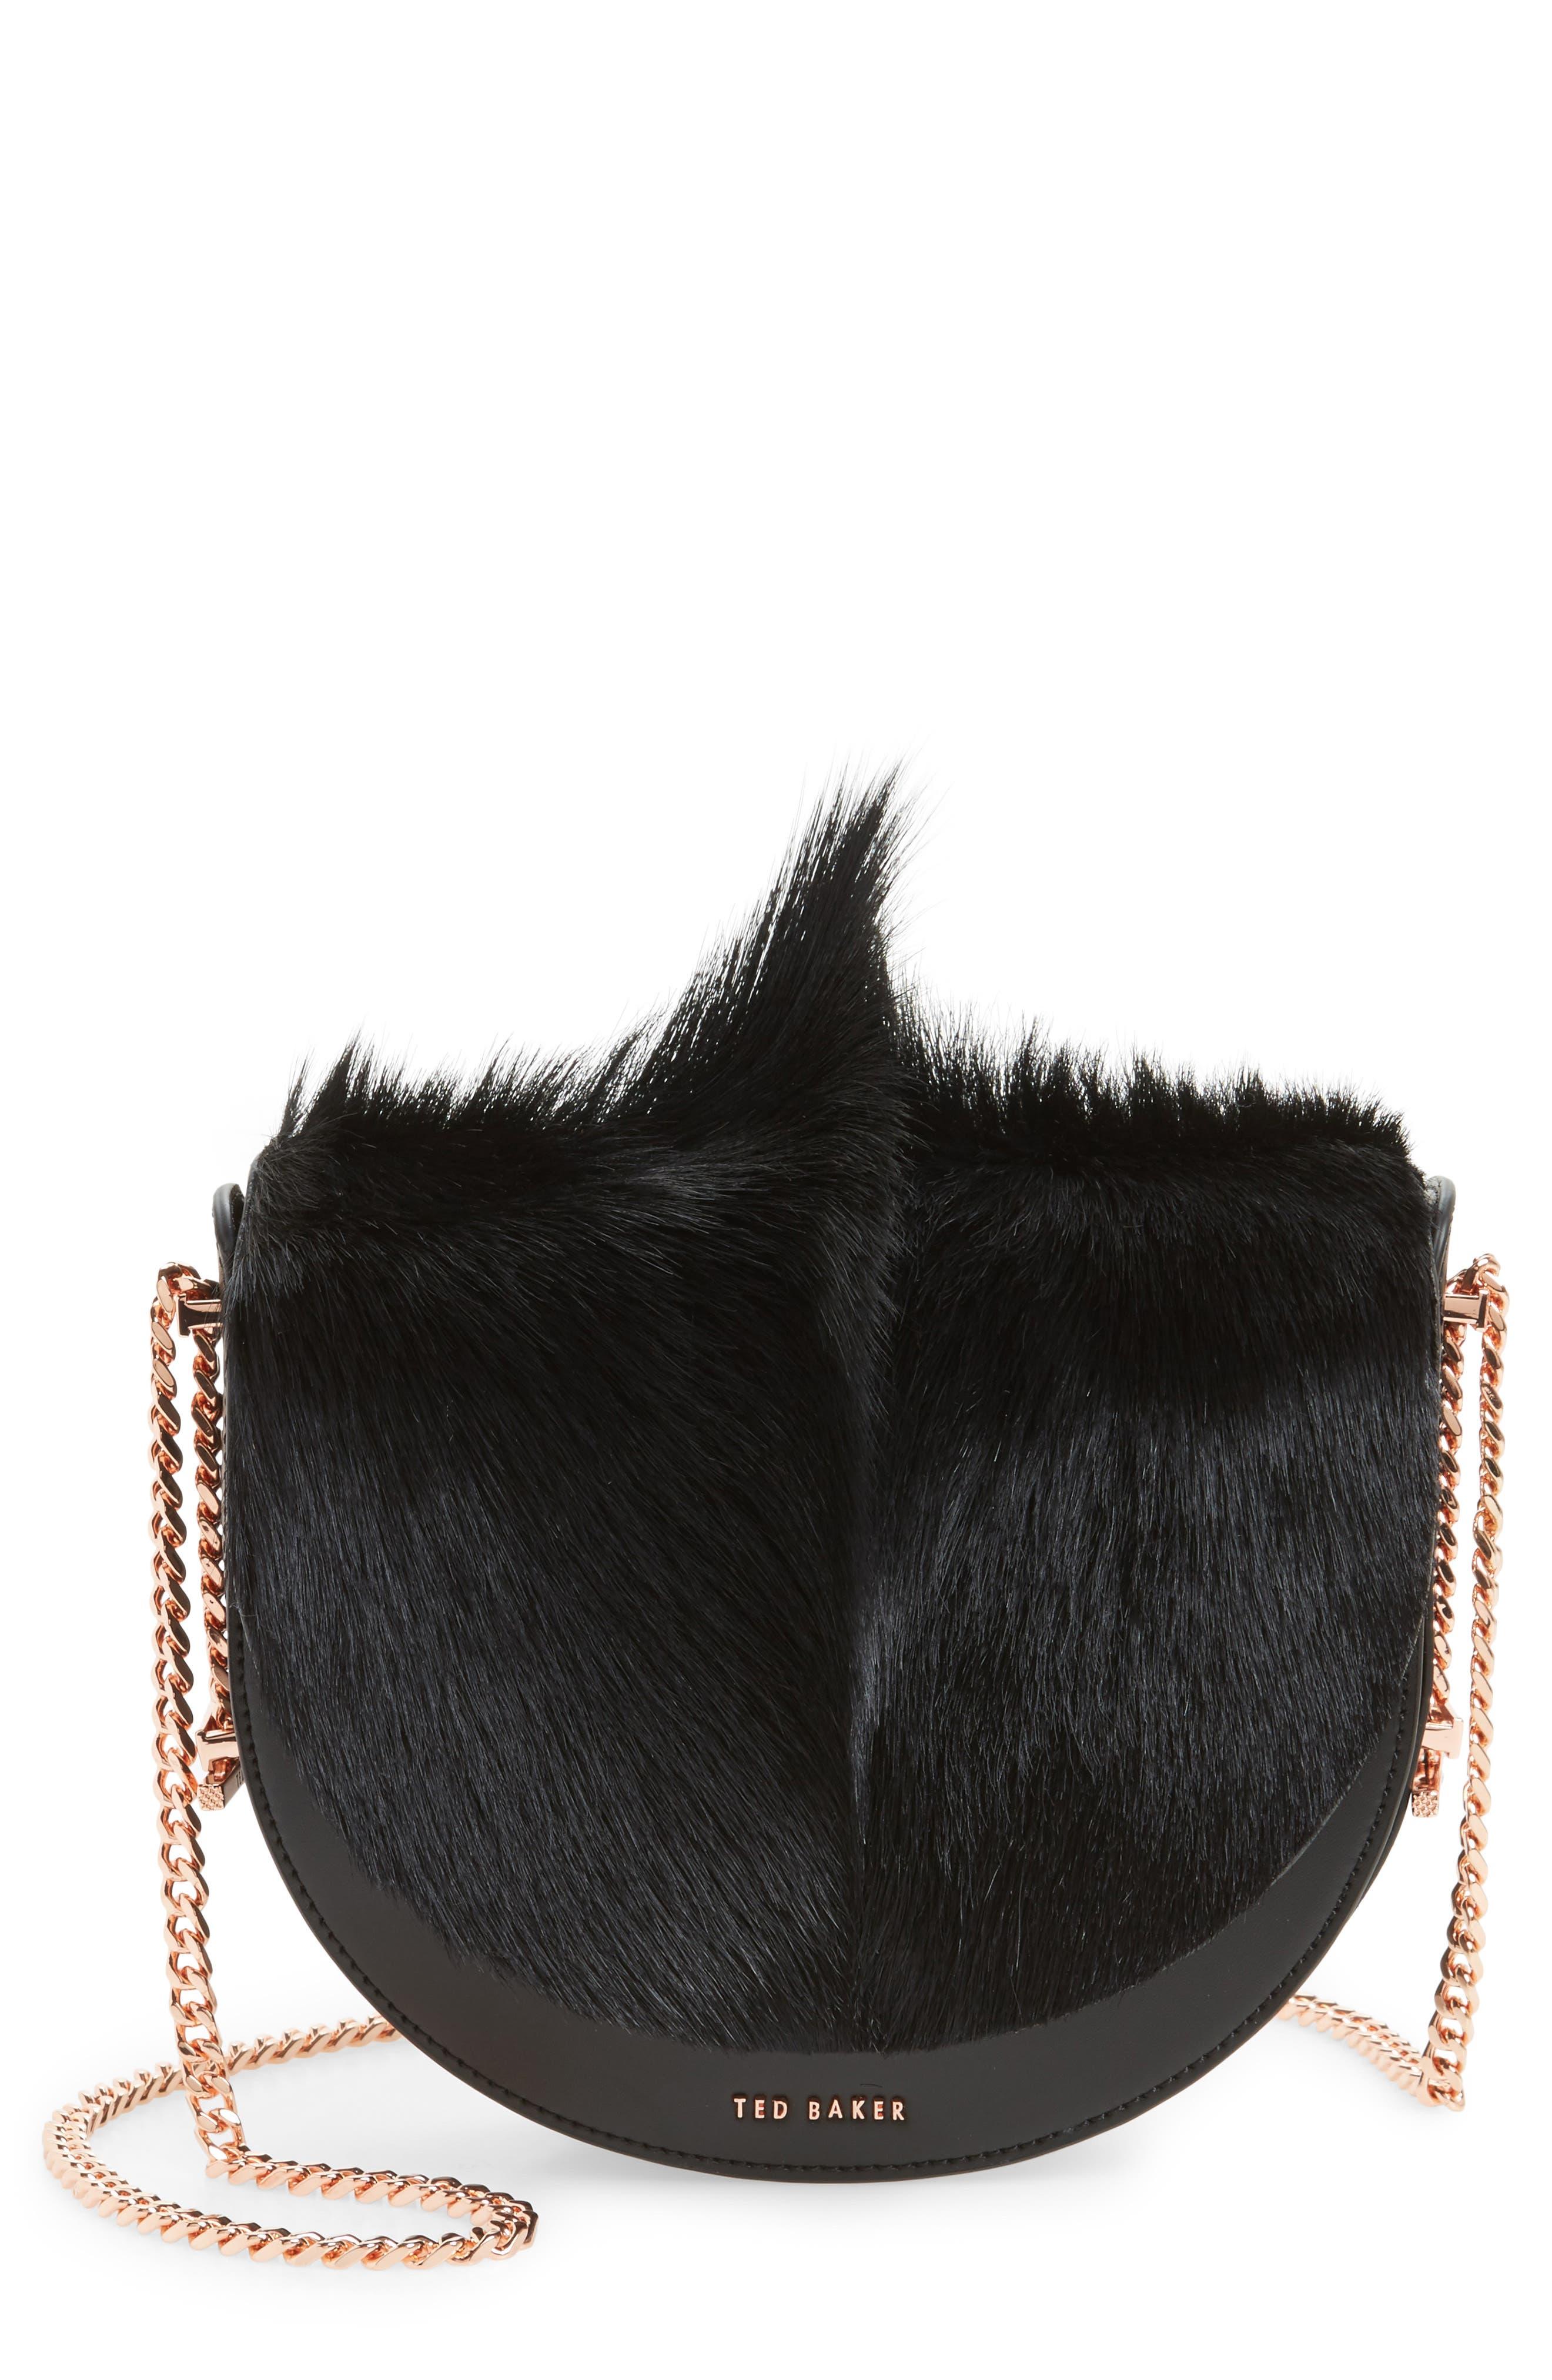 Ted Baker London Alisonn Leather & Genuine Springbok Fur Saddle Bag